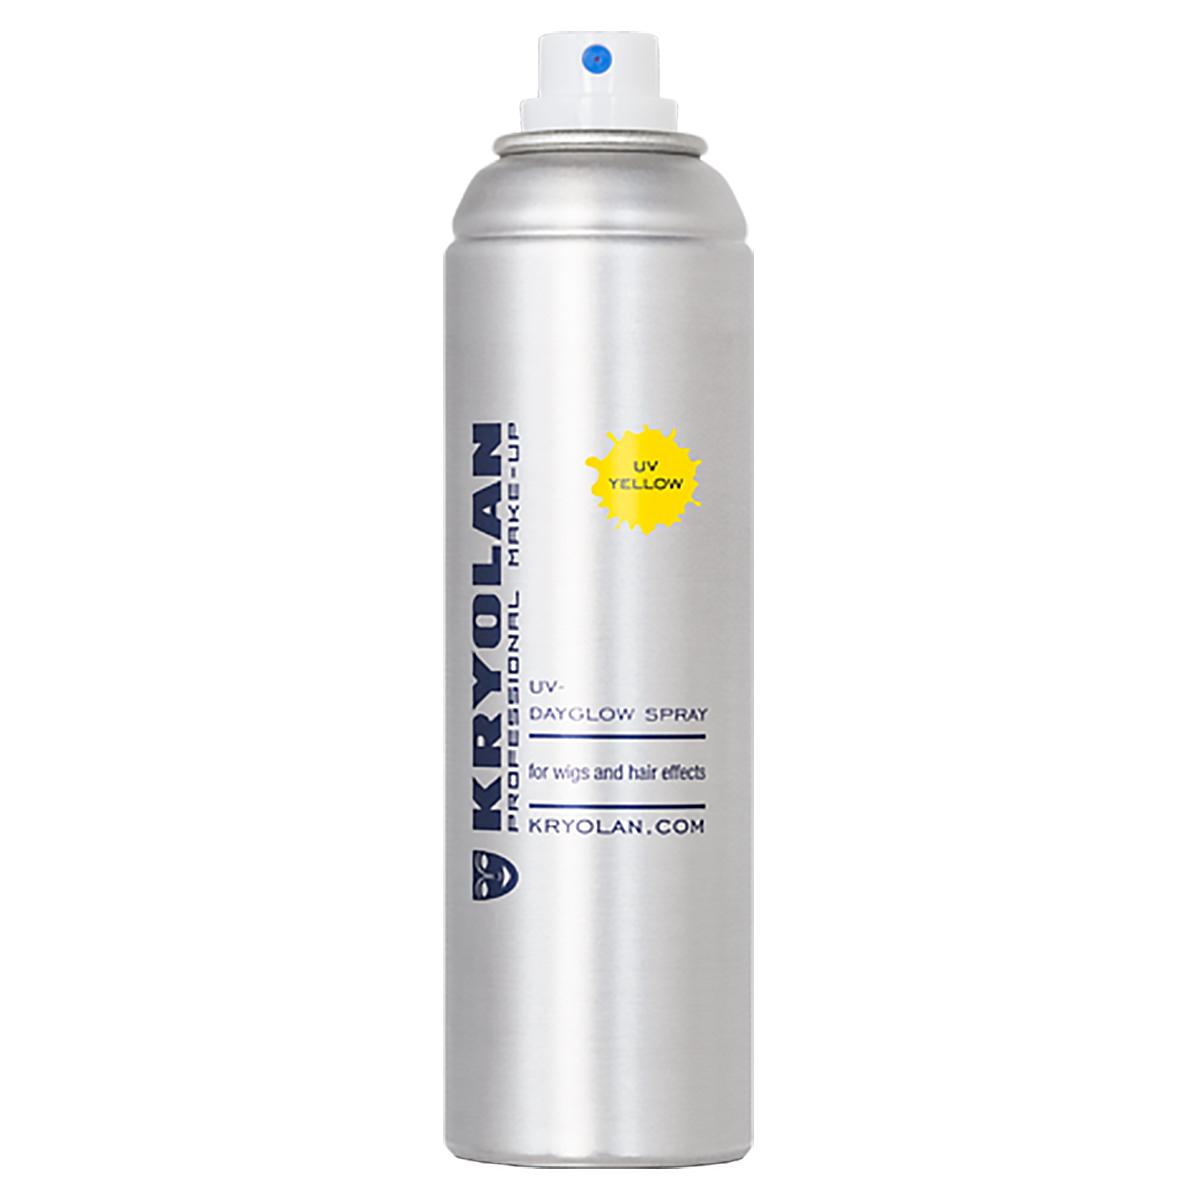 UV hårspray, gul